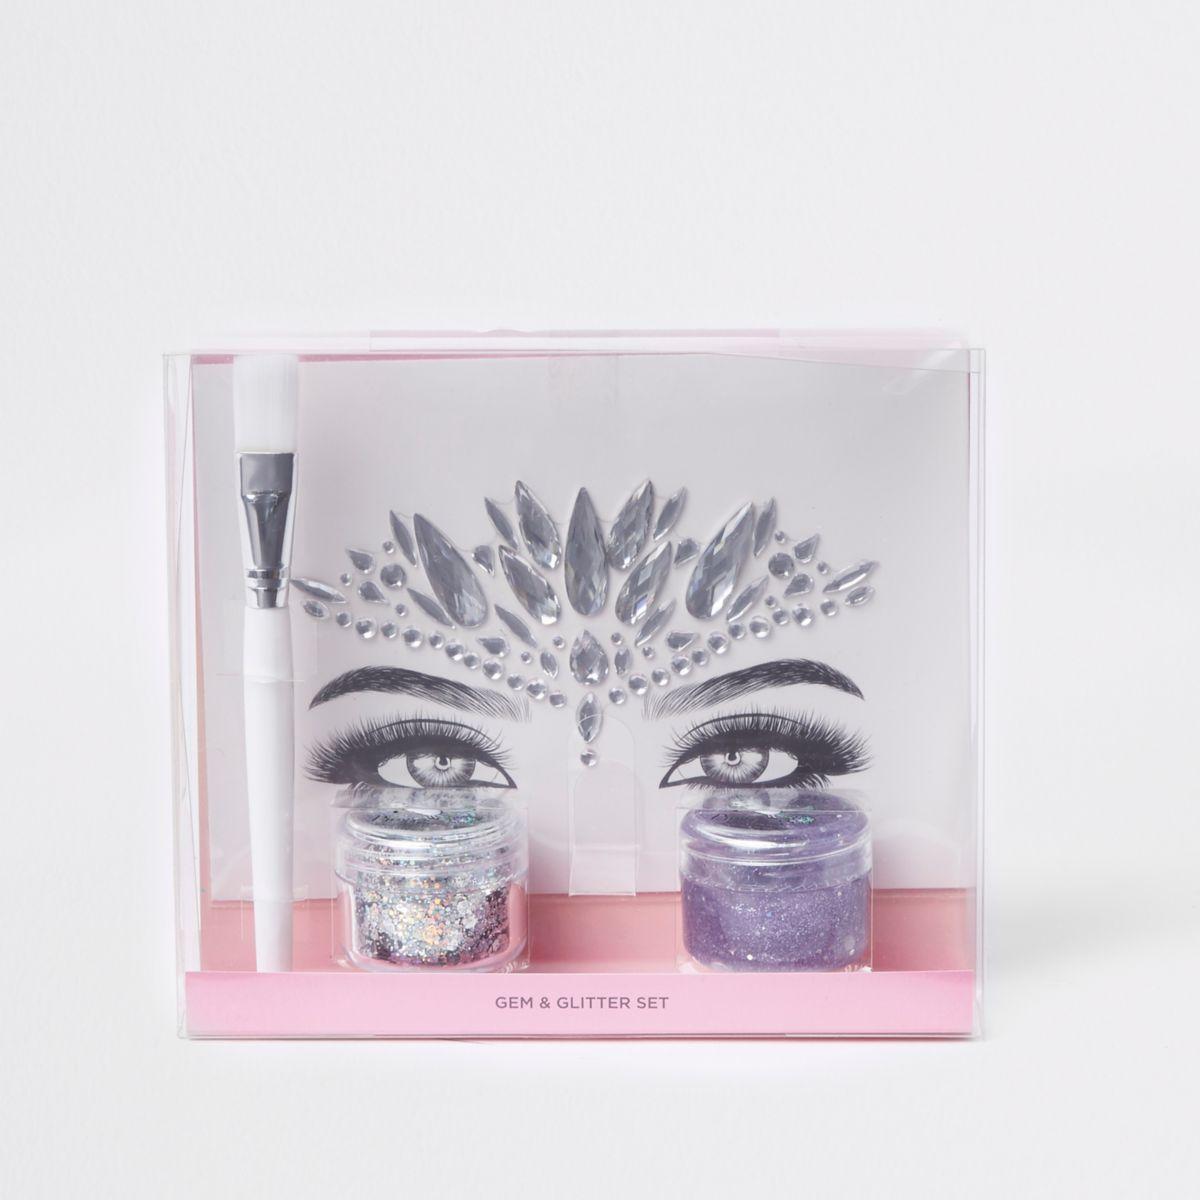 Prima silver gem and glitter makeup set